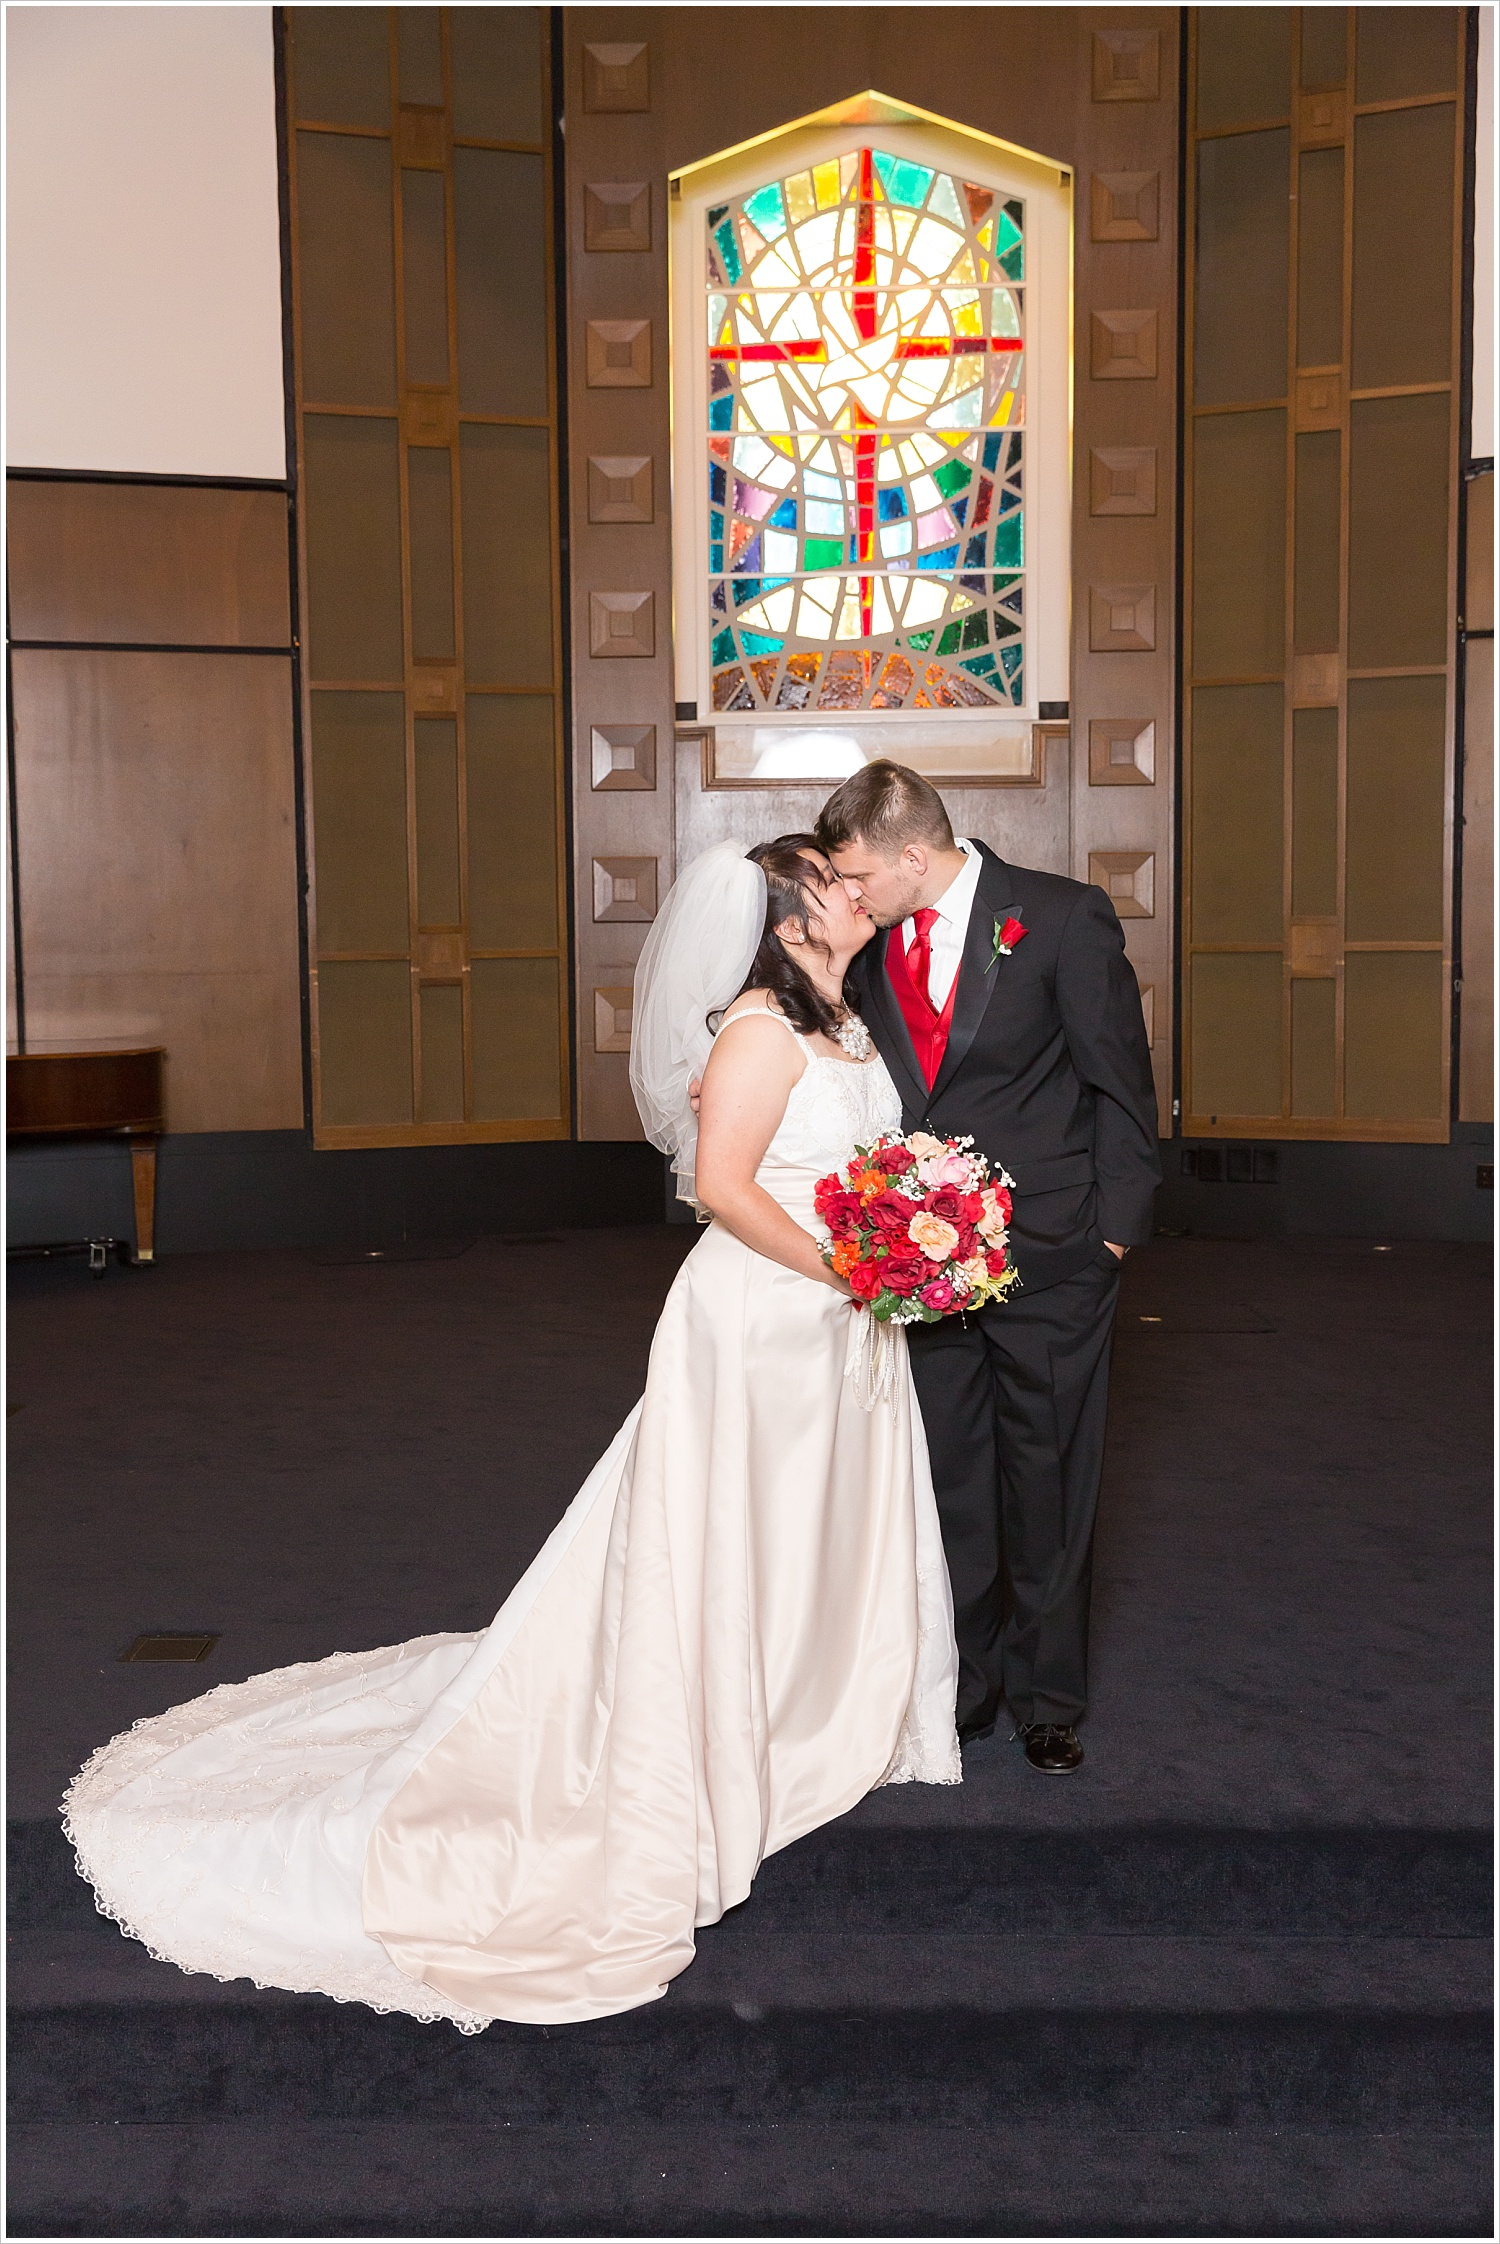 Bride and groom kiss in church chapel,Traditional Church wedding, Highland Baptist Church in Waco, Texas - Jason & Melaina Photography, www.jasonandmelaina.com